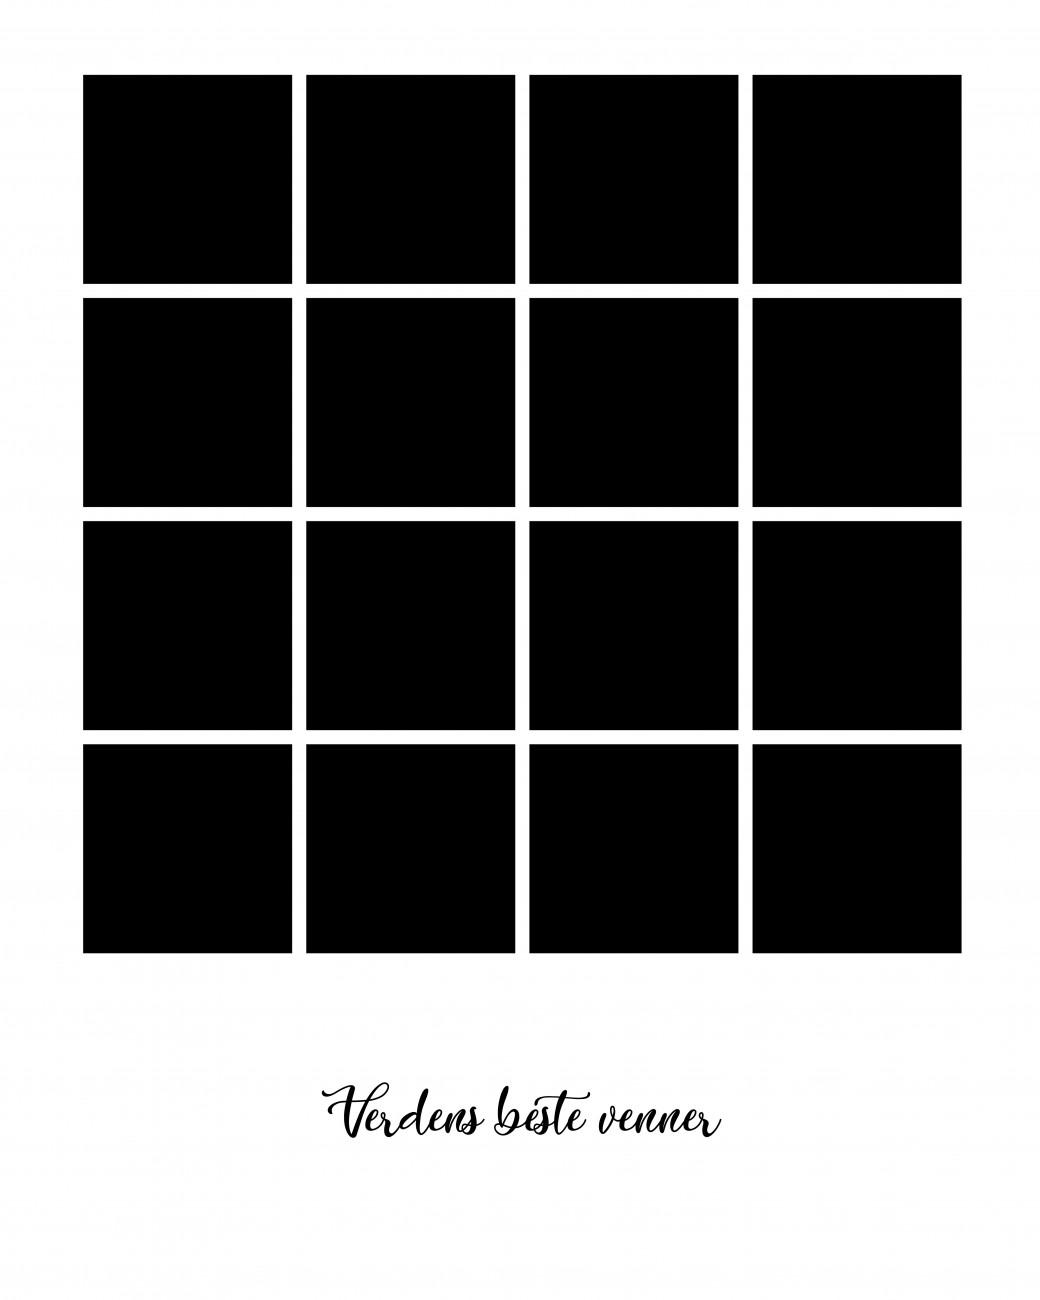 40x50 cm 02 - 16 bilder